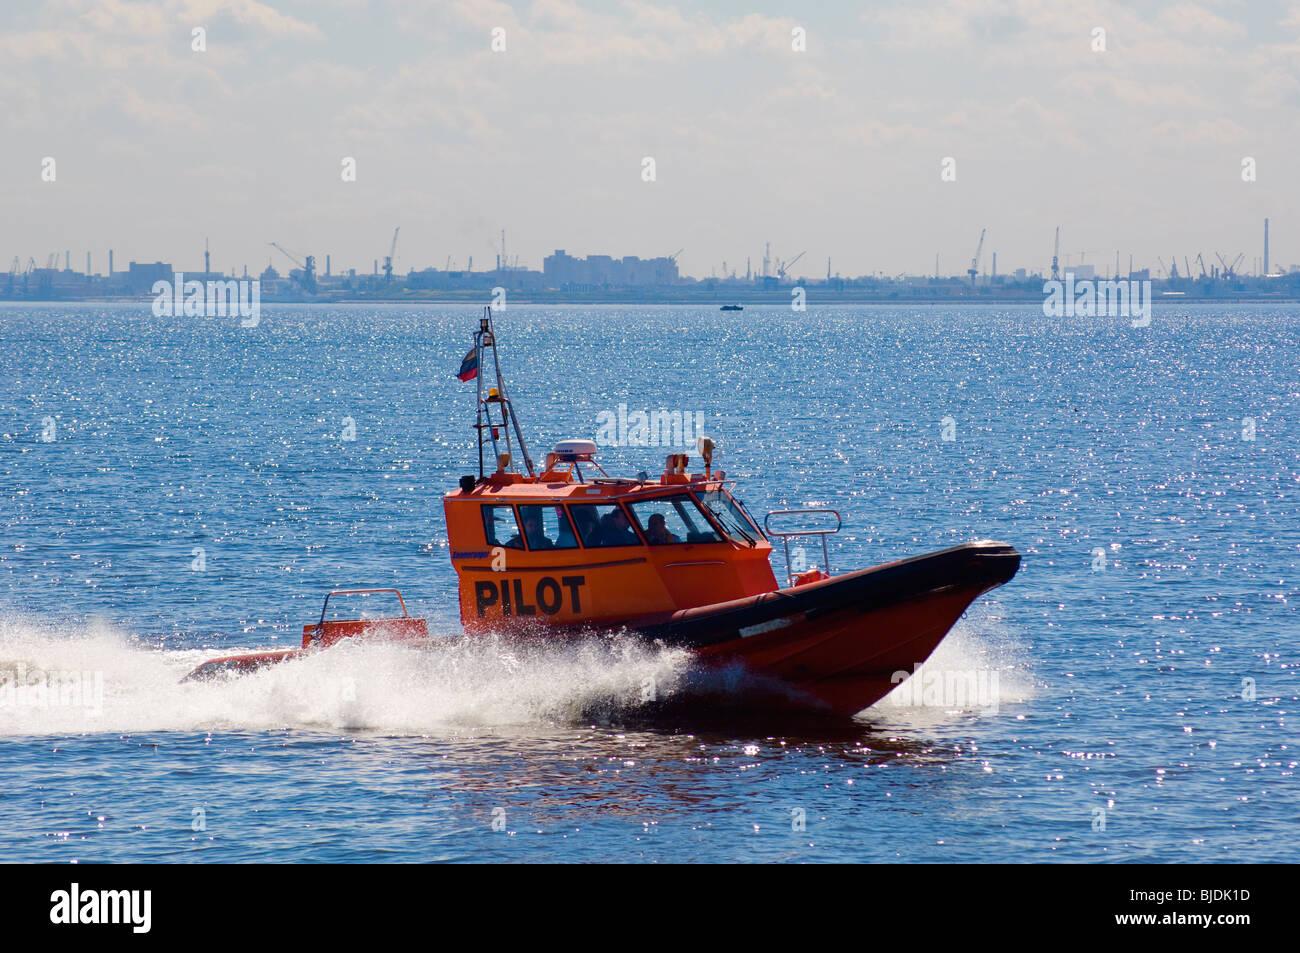 Pilot-boat in estuary of the River Neva, St Petersburg, Russia - Stock Image